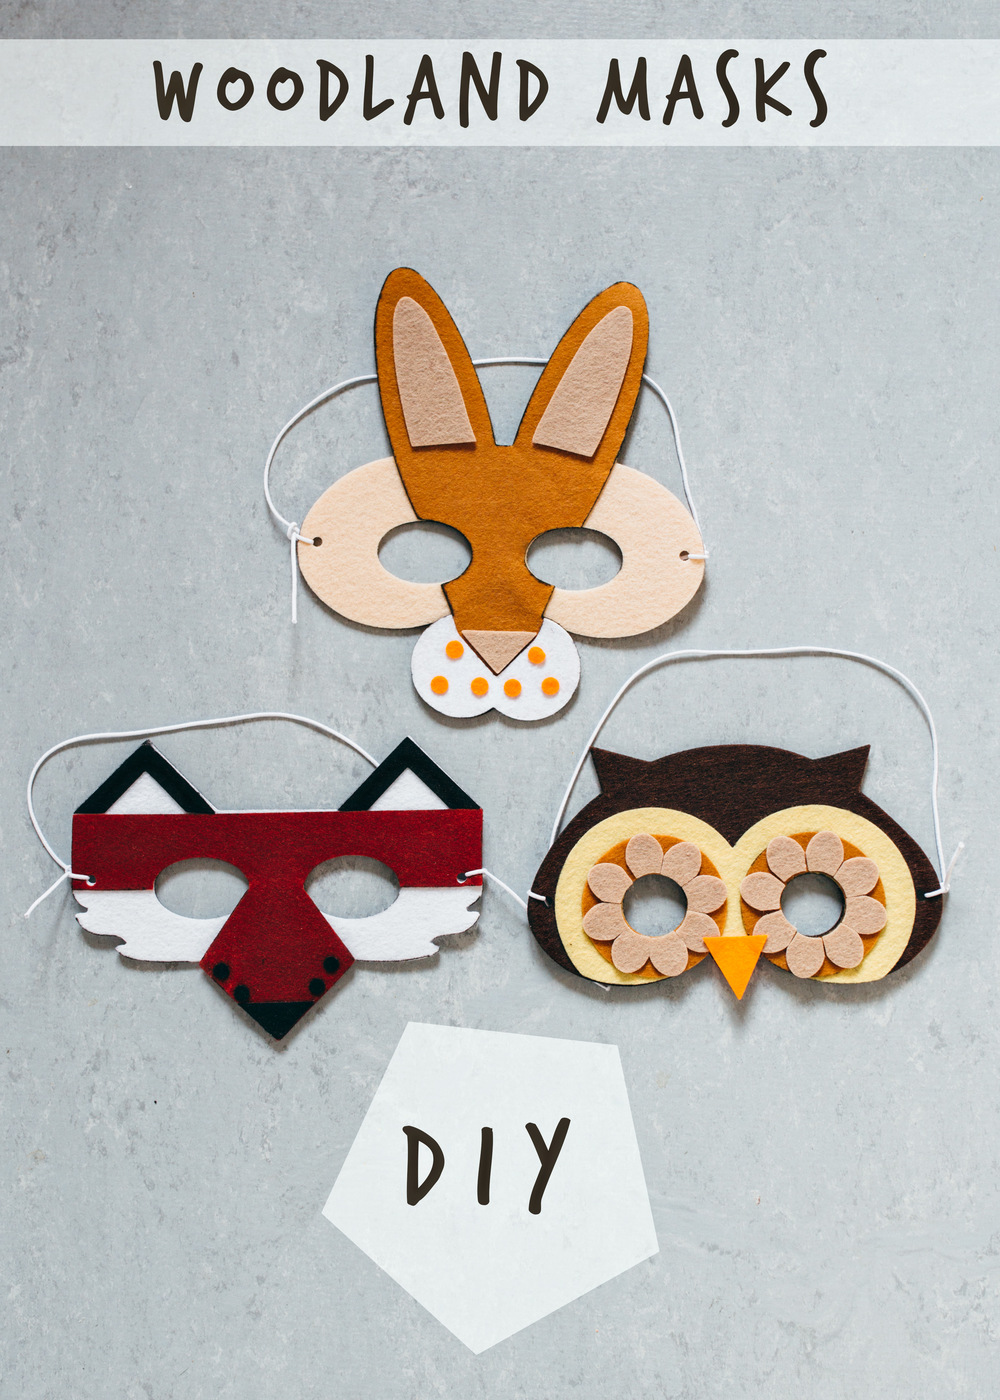 Woodland Masks DIY